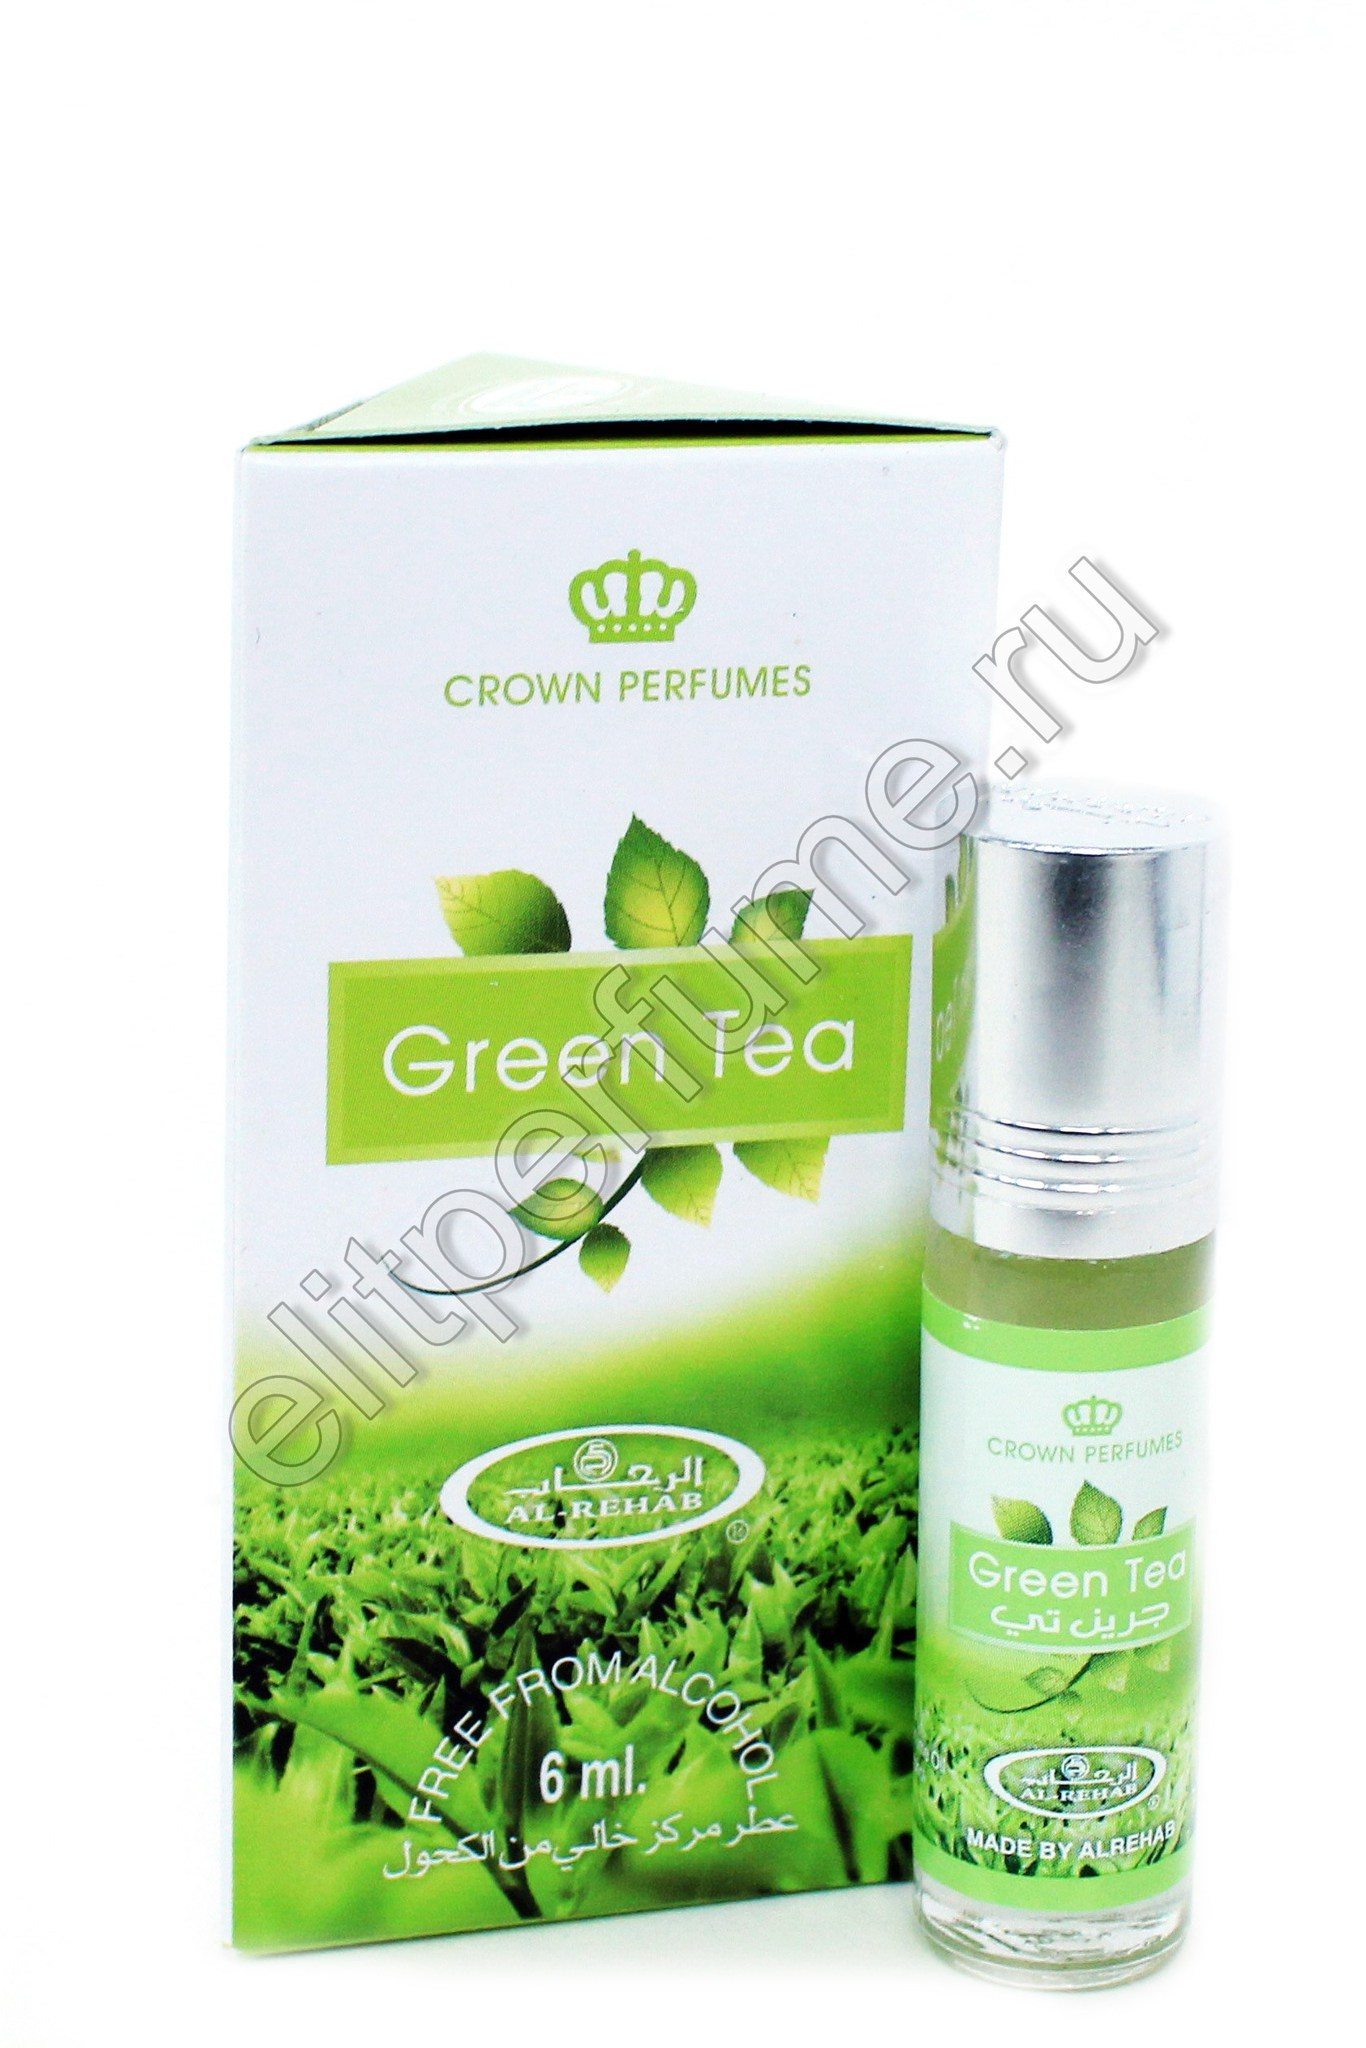 Green Tea Зеленый Чай 6 мл арабские масляные духи от Аль Рехаб Al Rehab